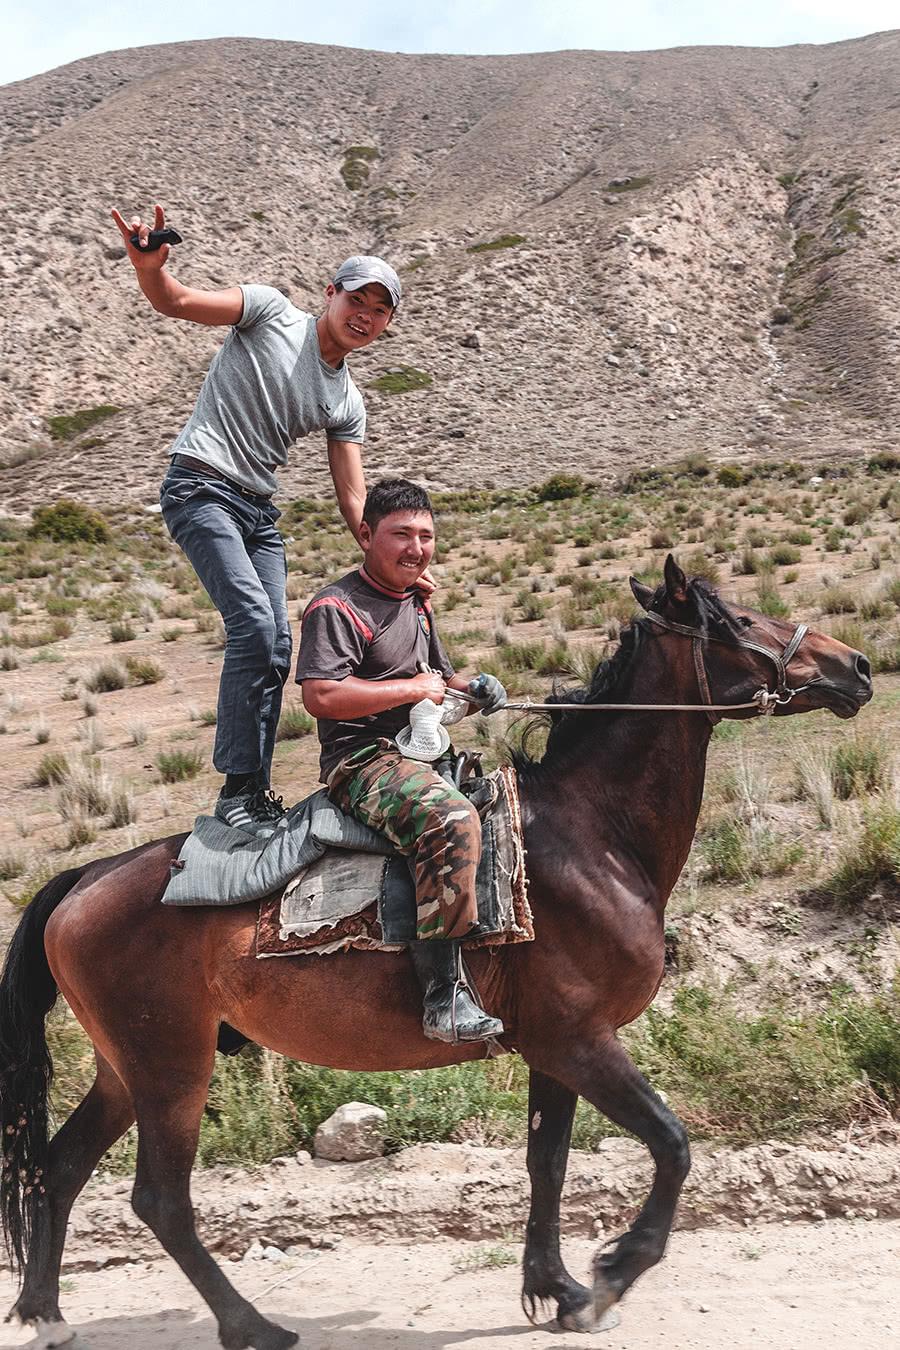 Kyrgyz men riding on horseback in the Barskoon Valley, Kyrgyzstan.